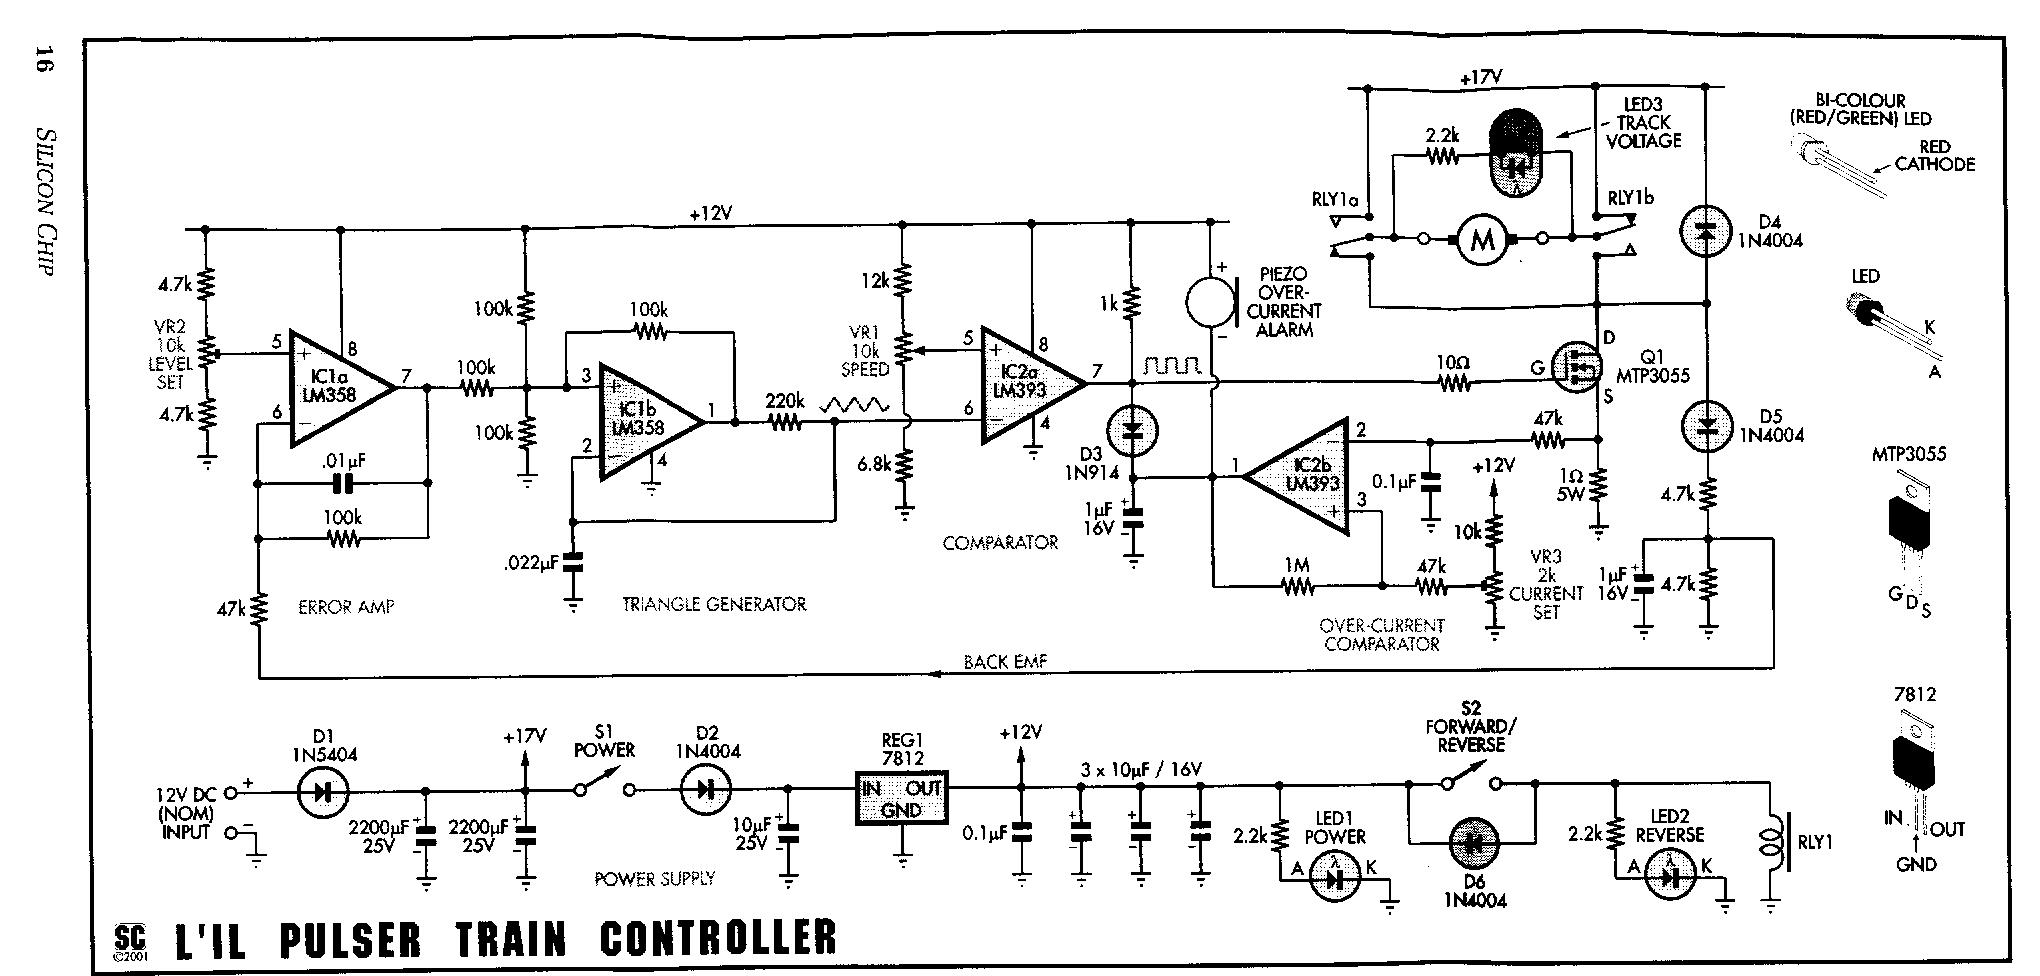 Pulse Train Controller